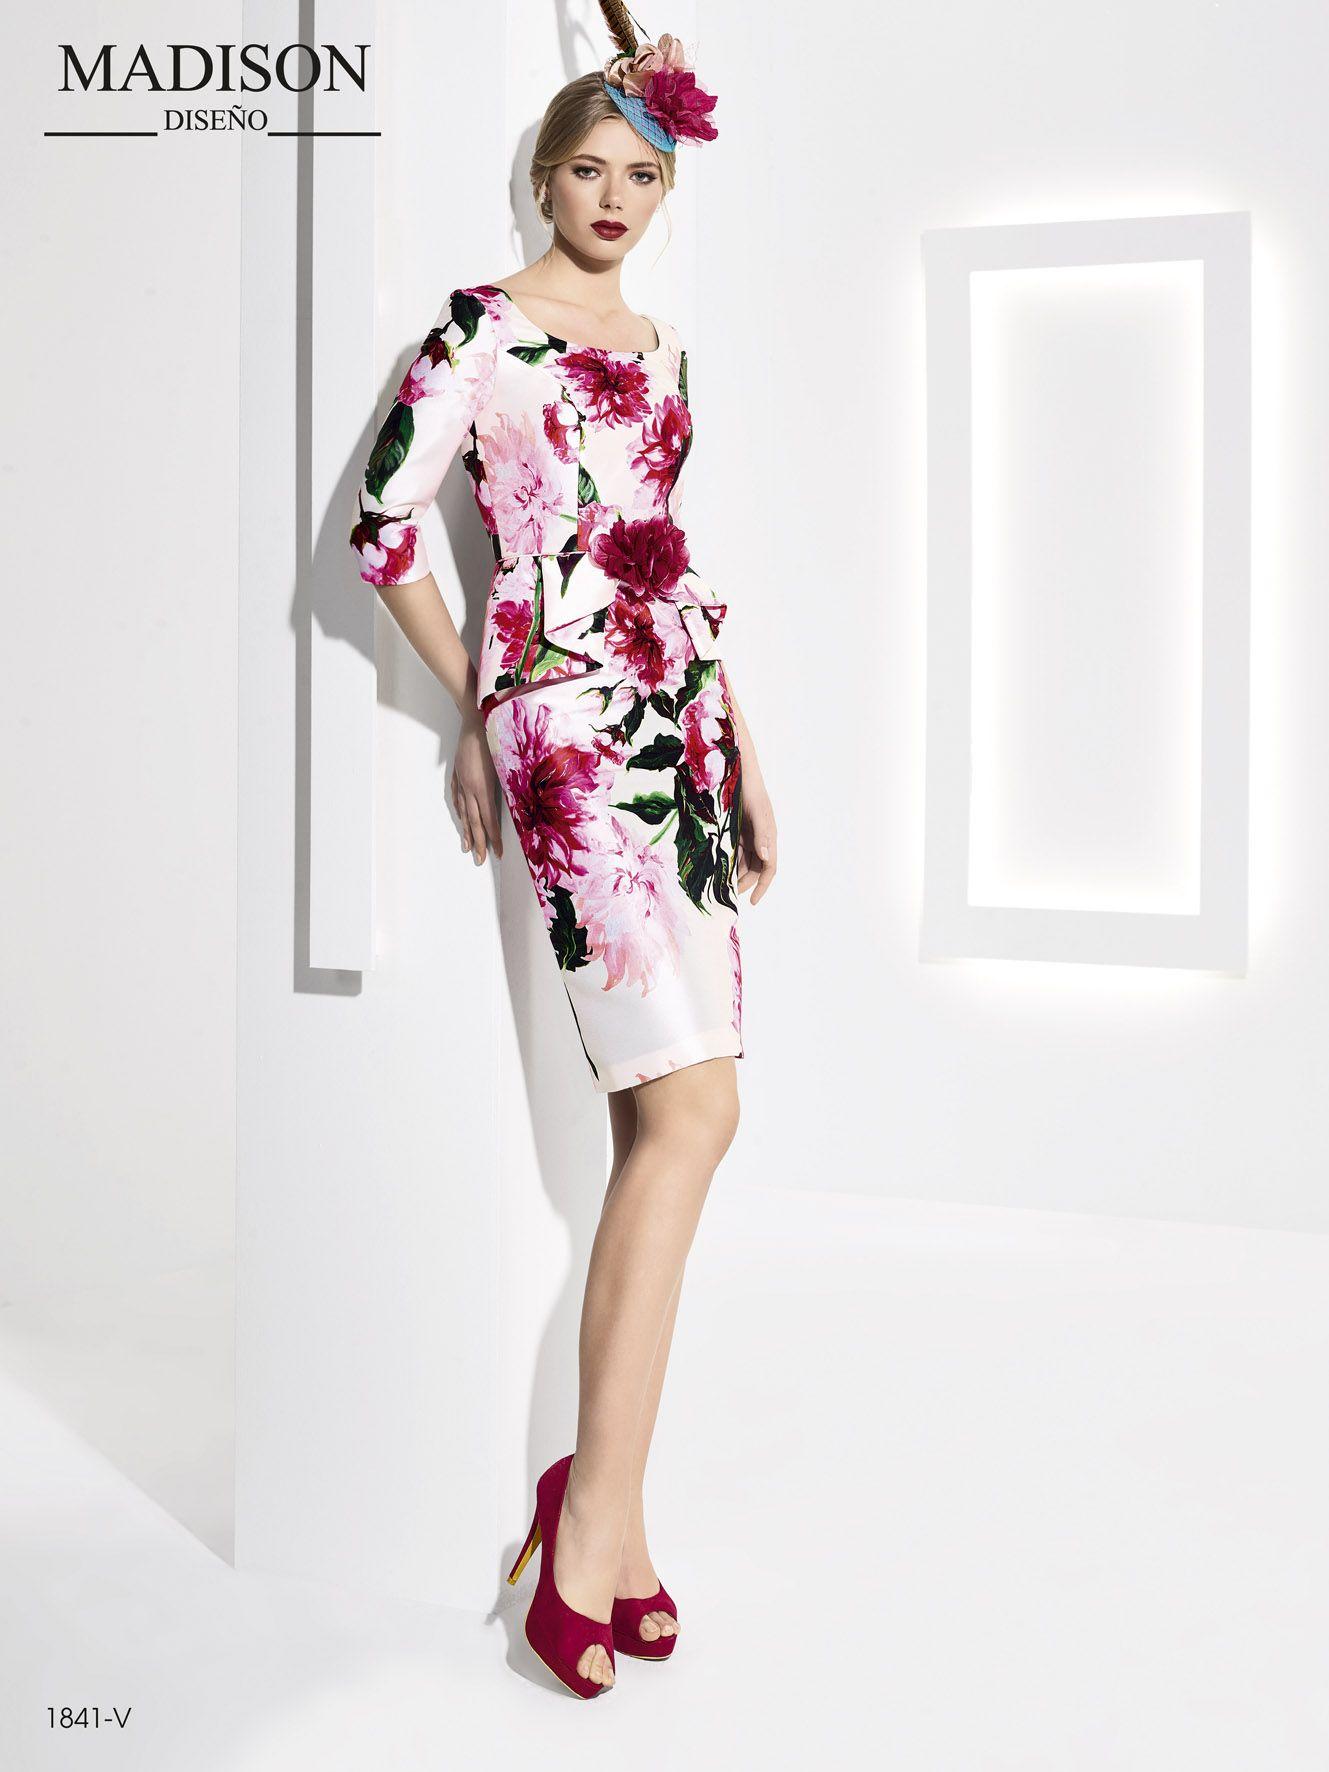 967d607637 Elegante vestido de fiesta  Madison en mikado estampado  vestidodefiesta   fashion  moda  gala  glamour  invitadaperfecta   dressing  dress  love